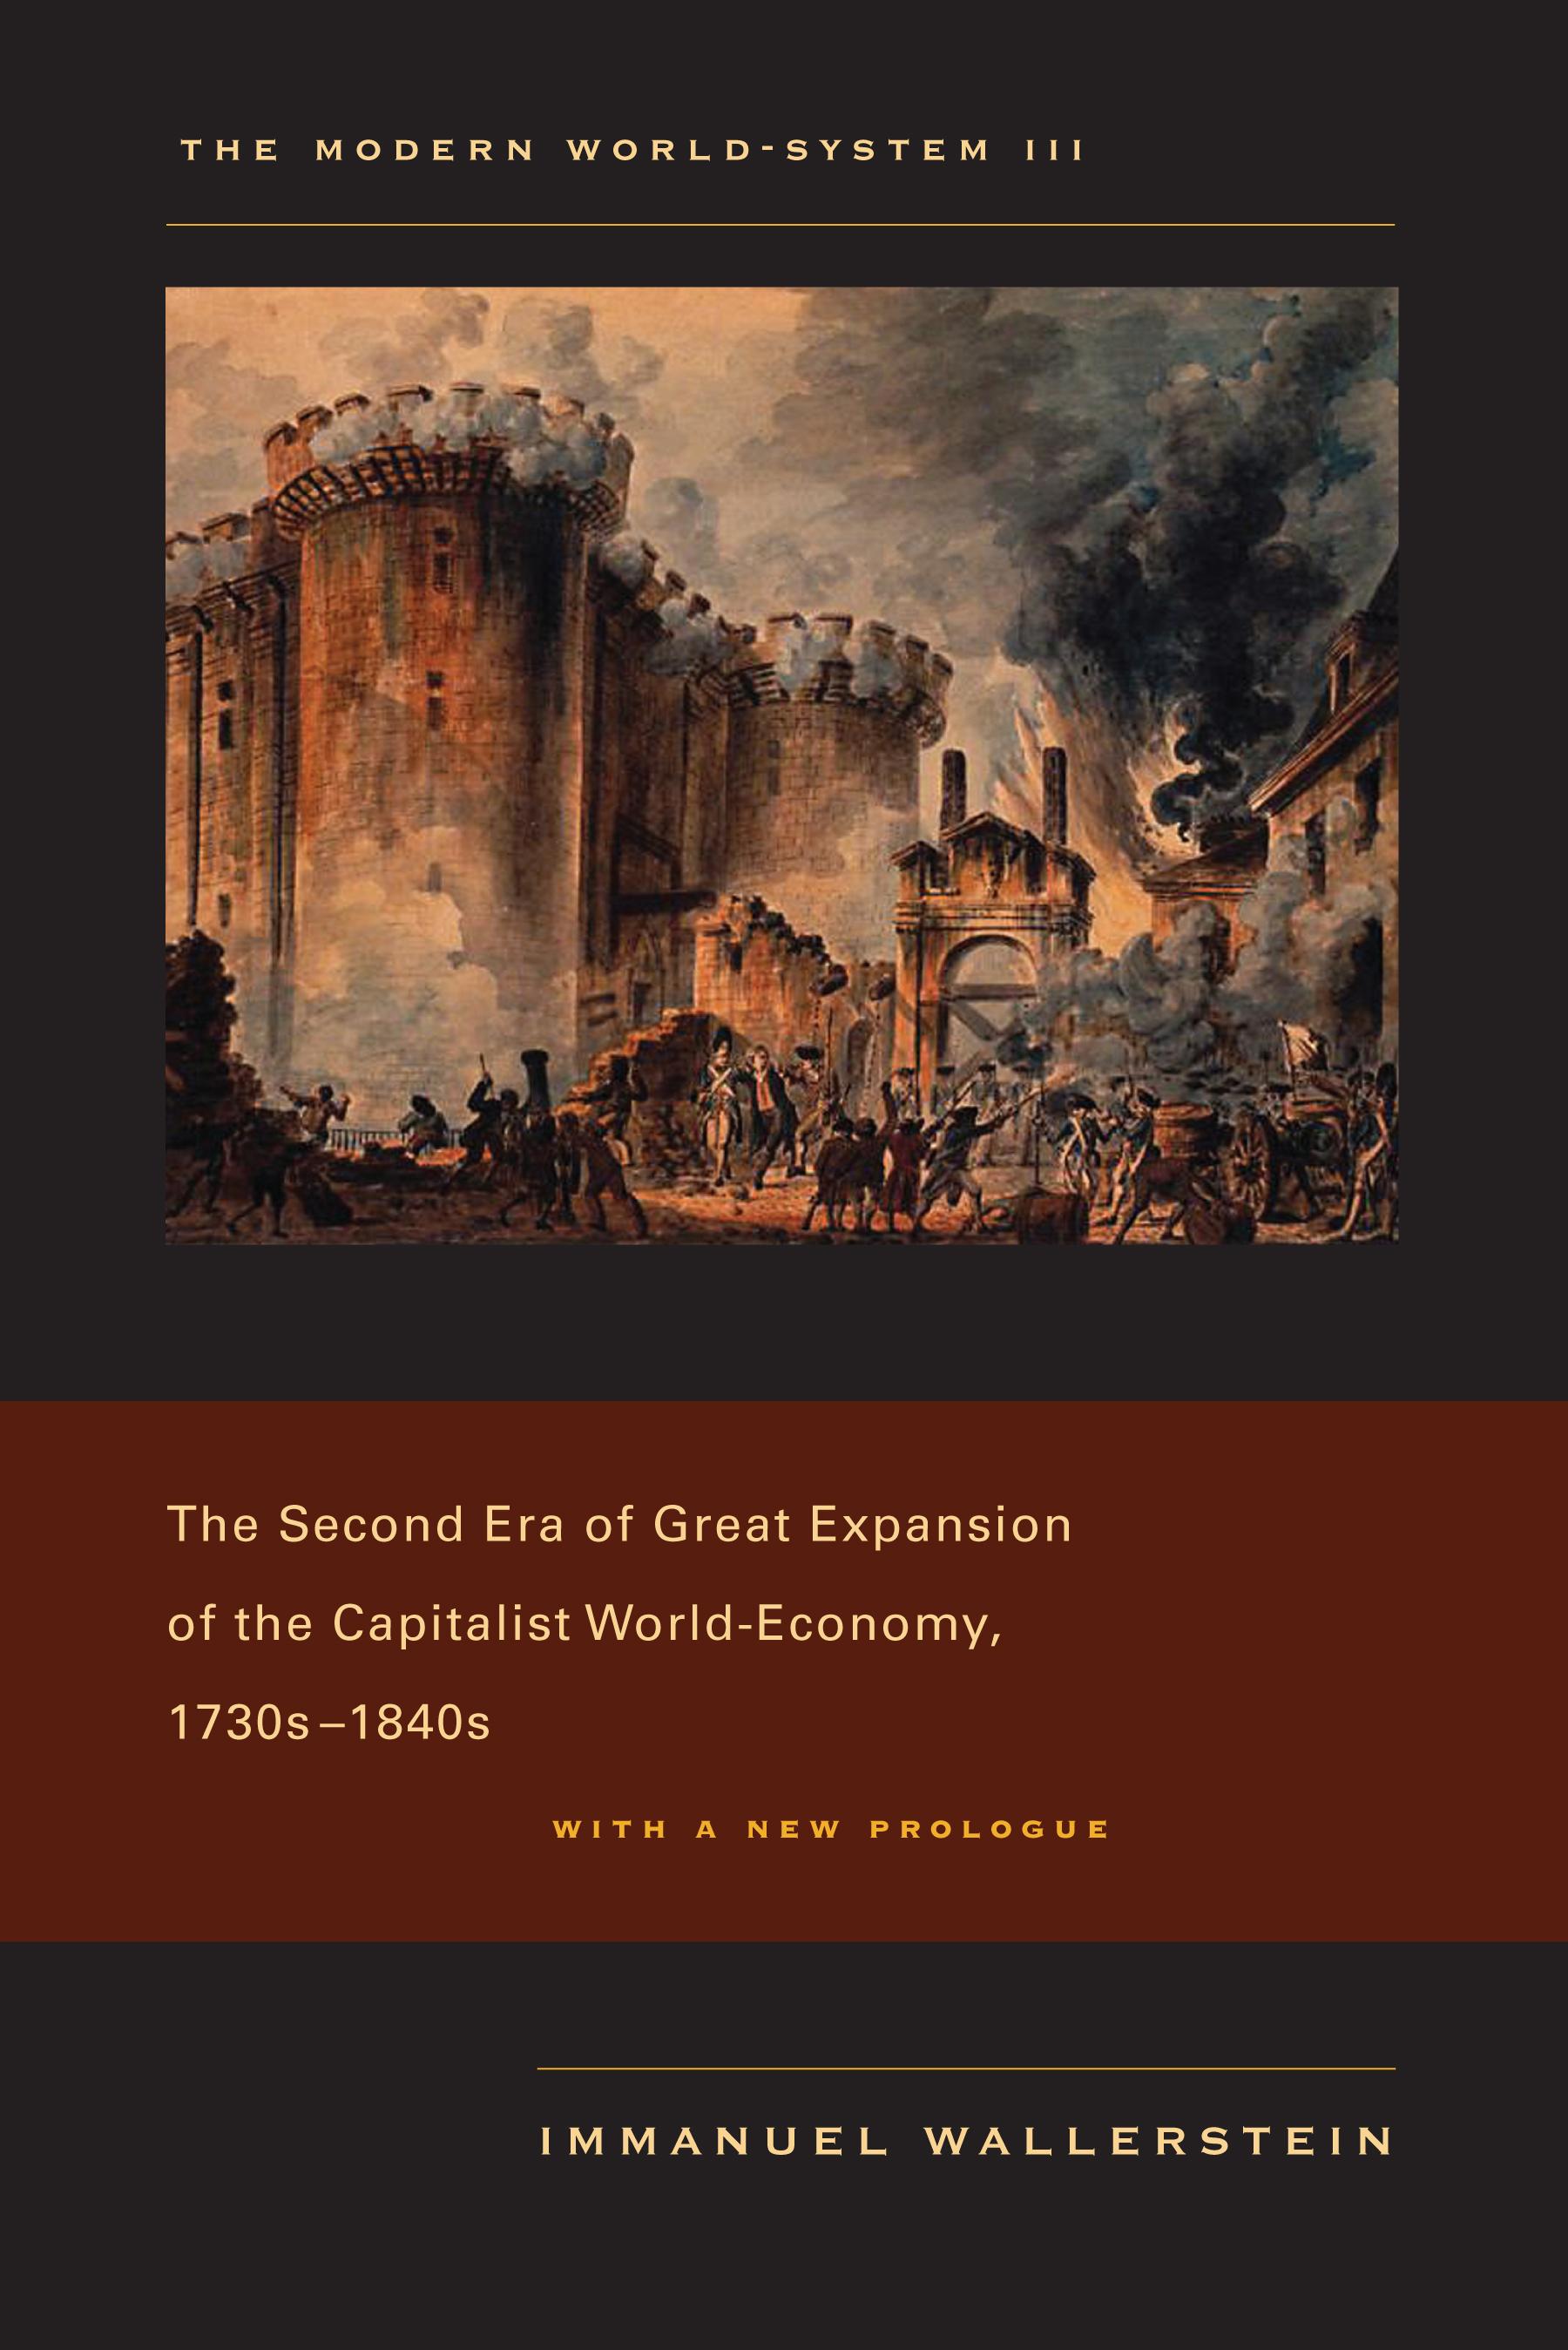 Download Ebook The Modern World-System III by Immanuel Wallerstein Pdf